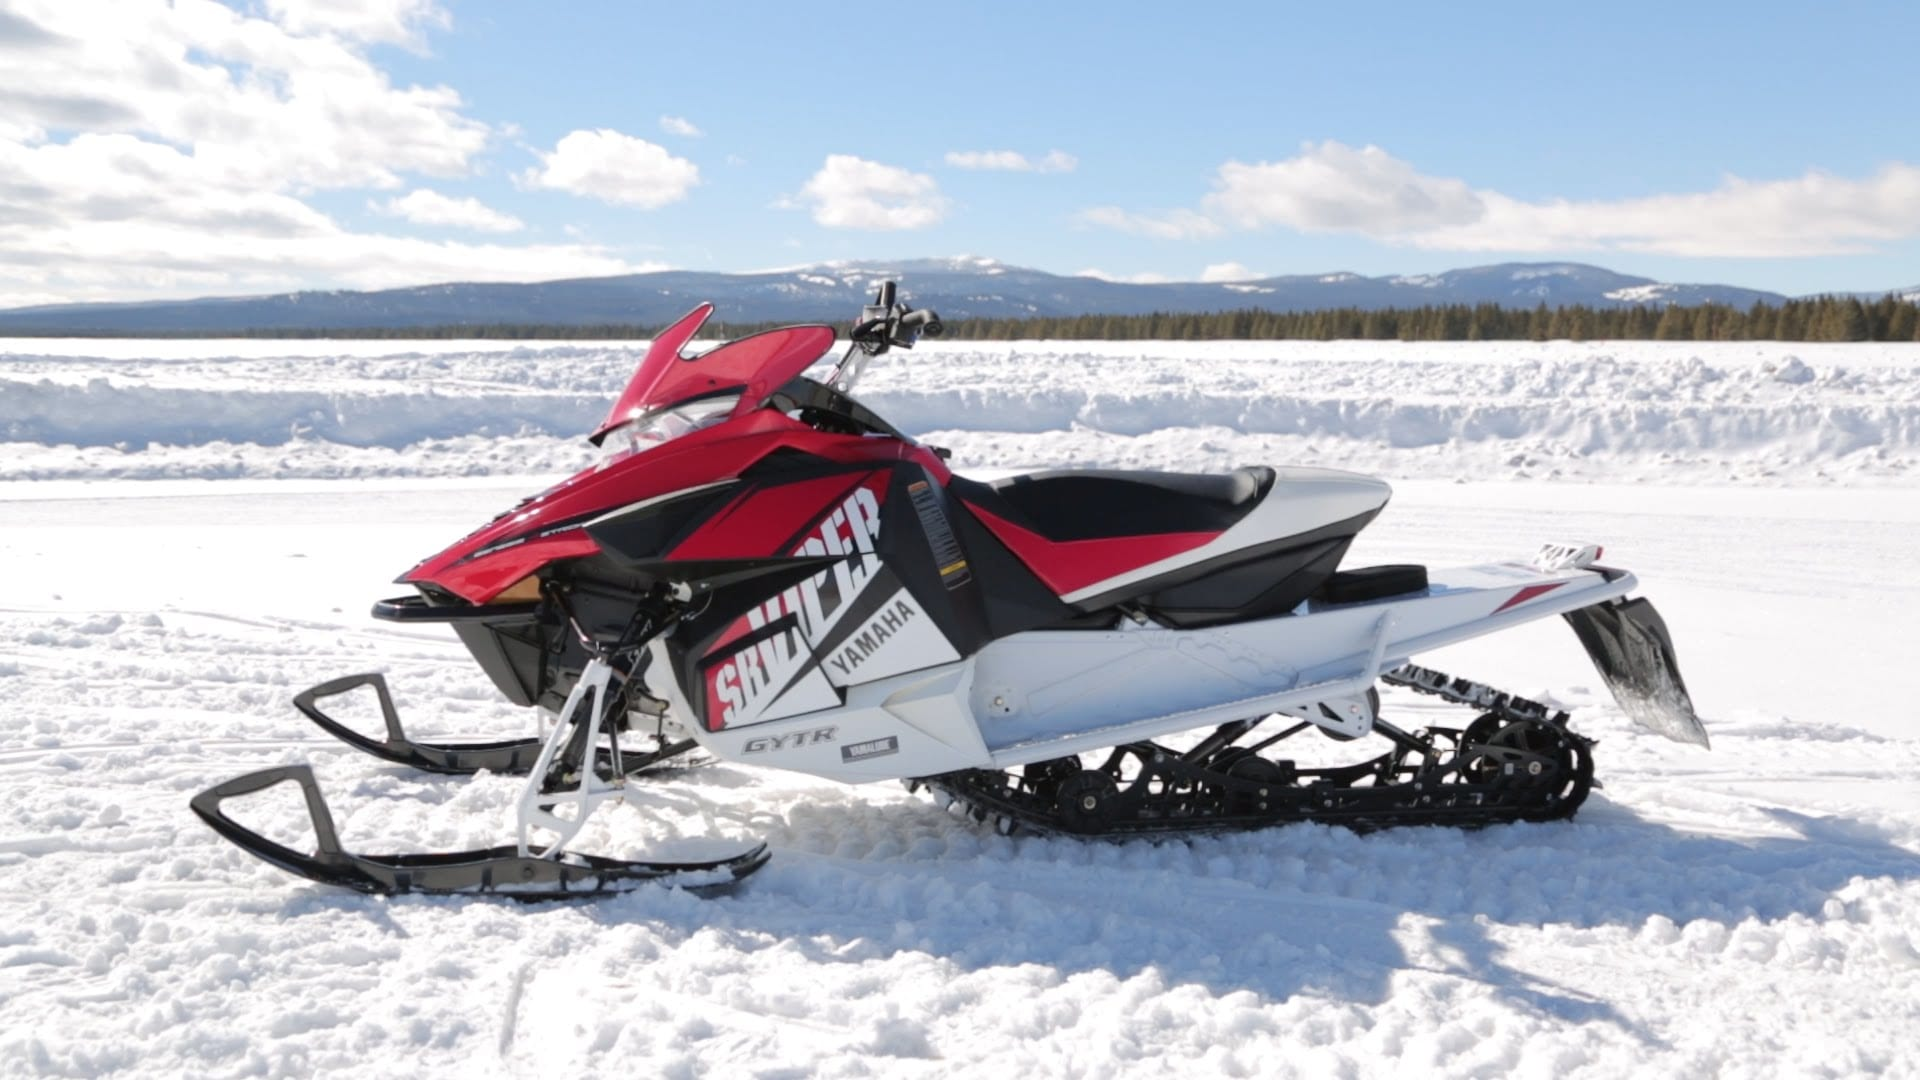 2016 Yamaha SR Viper SR 10 Snowmobile Turbo Recall Alert